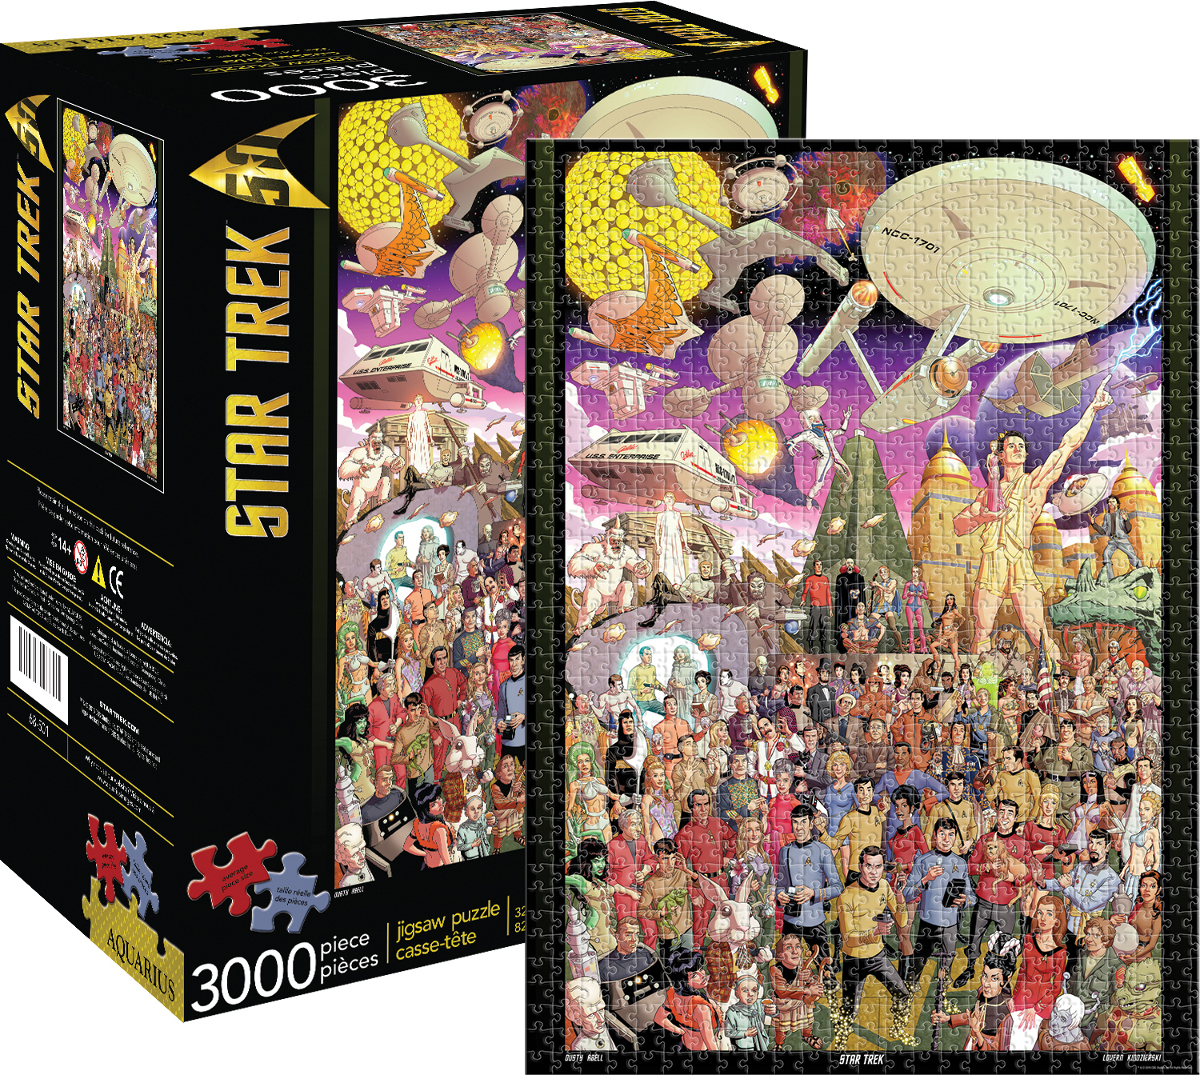 Star Trek 50th Anniversary Movies / Books / TV Jigsaw Puzzle